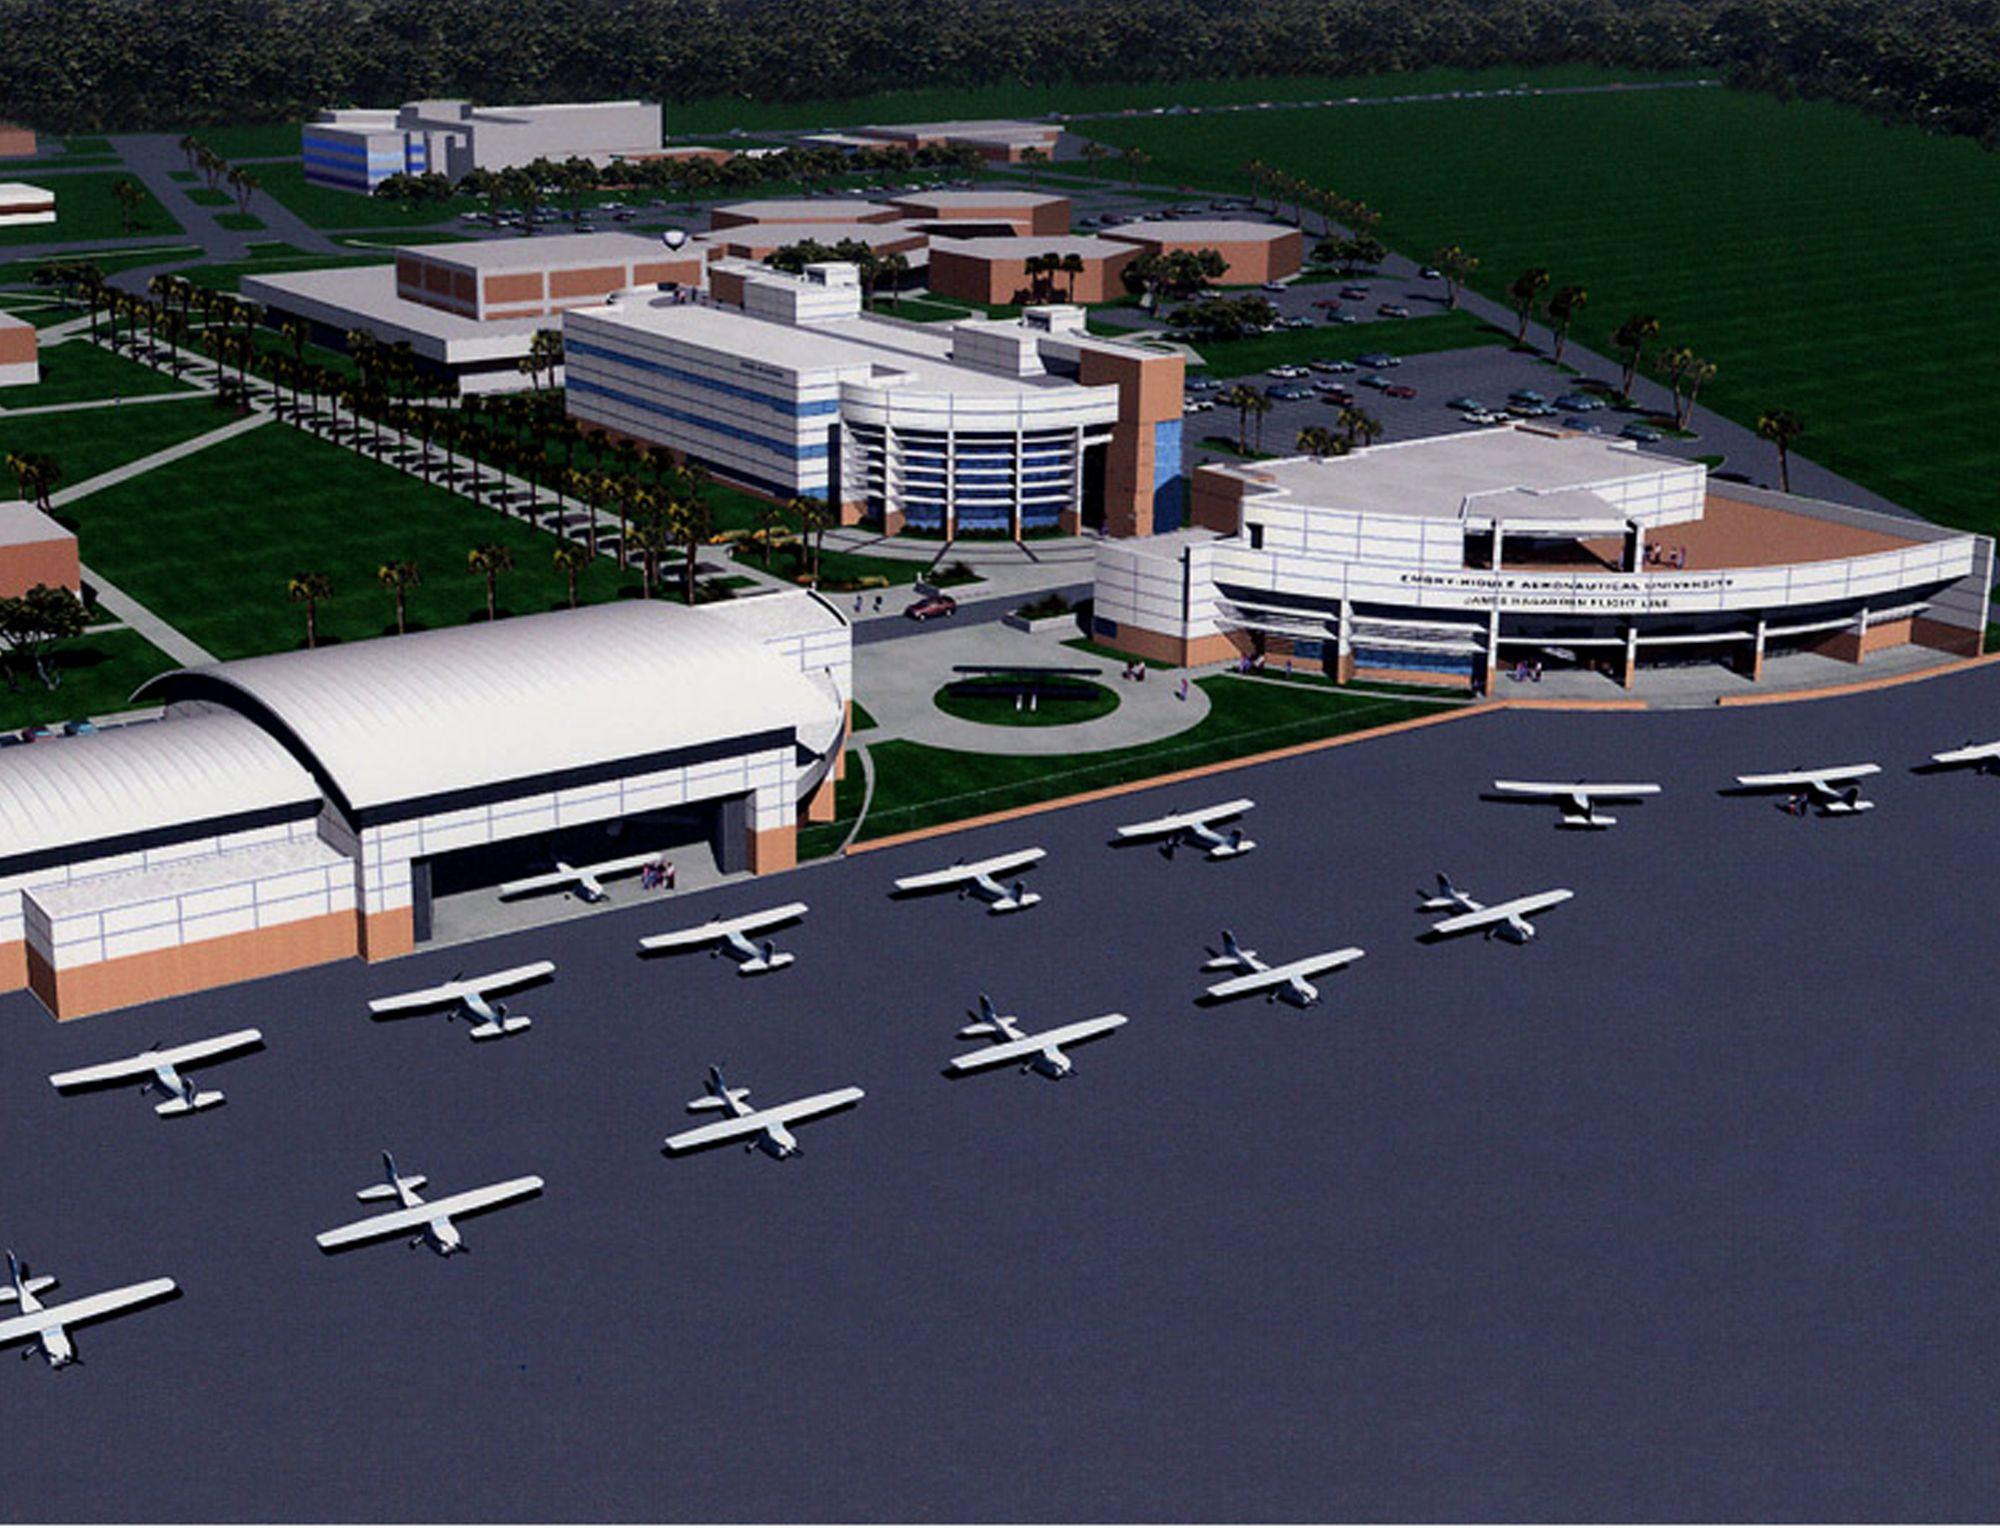 Embry Riddle Aeronautical University Daytona Beach Fl